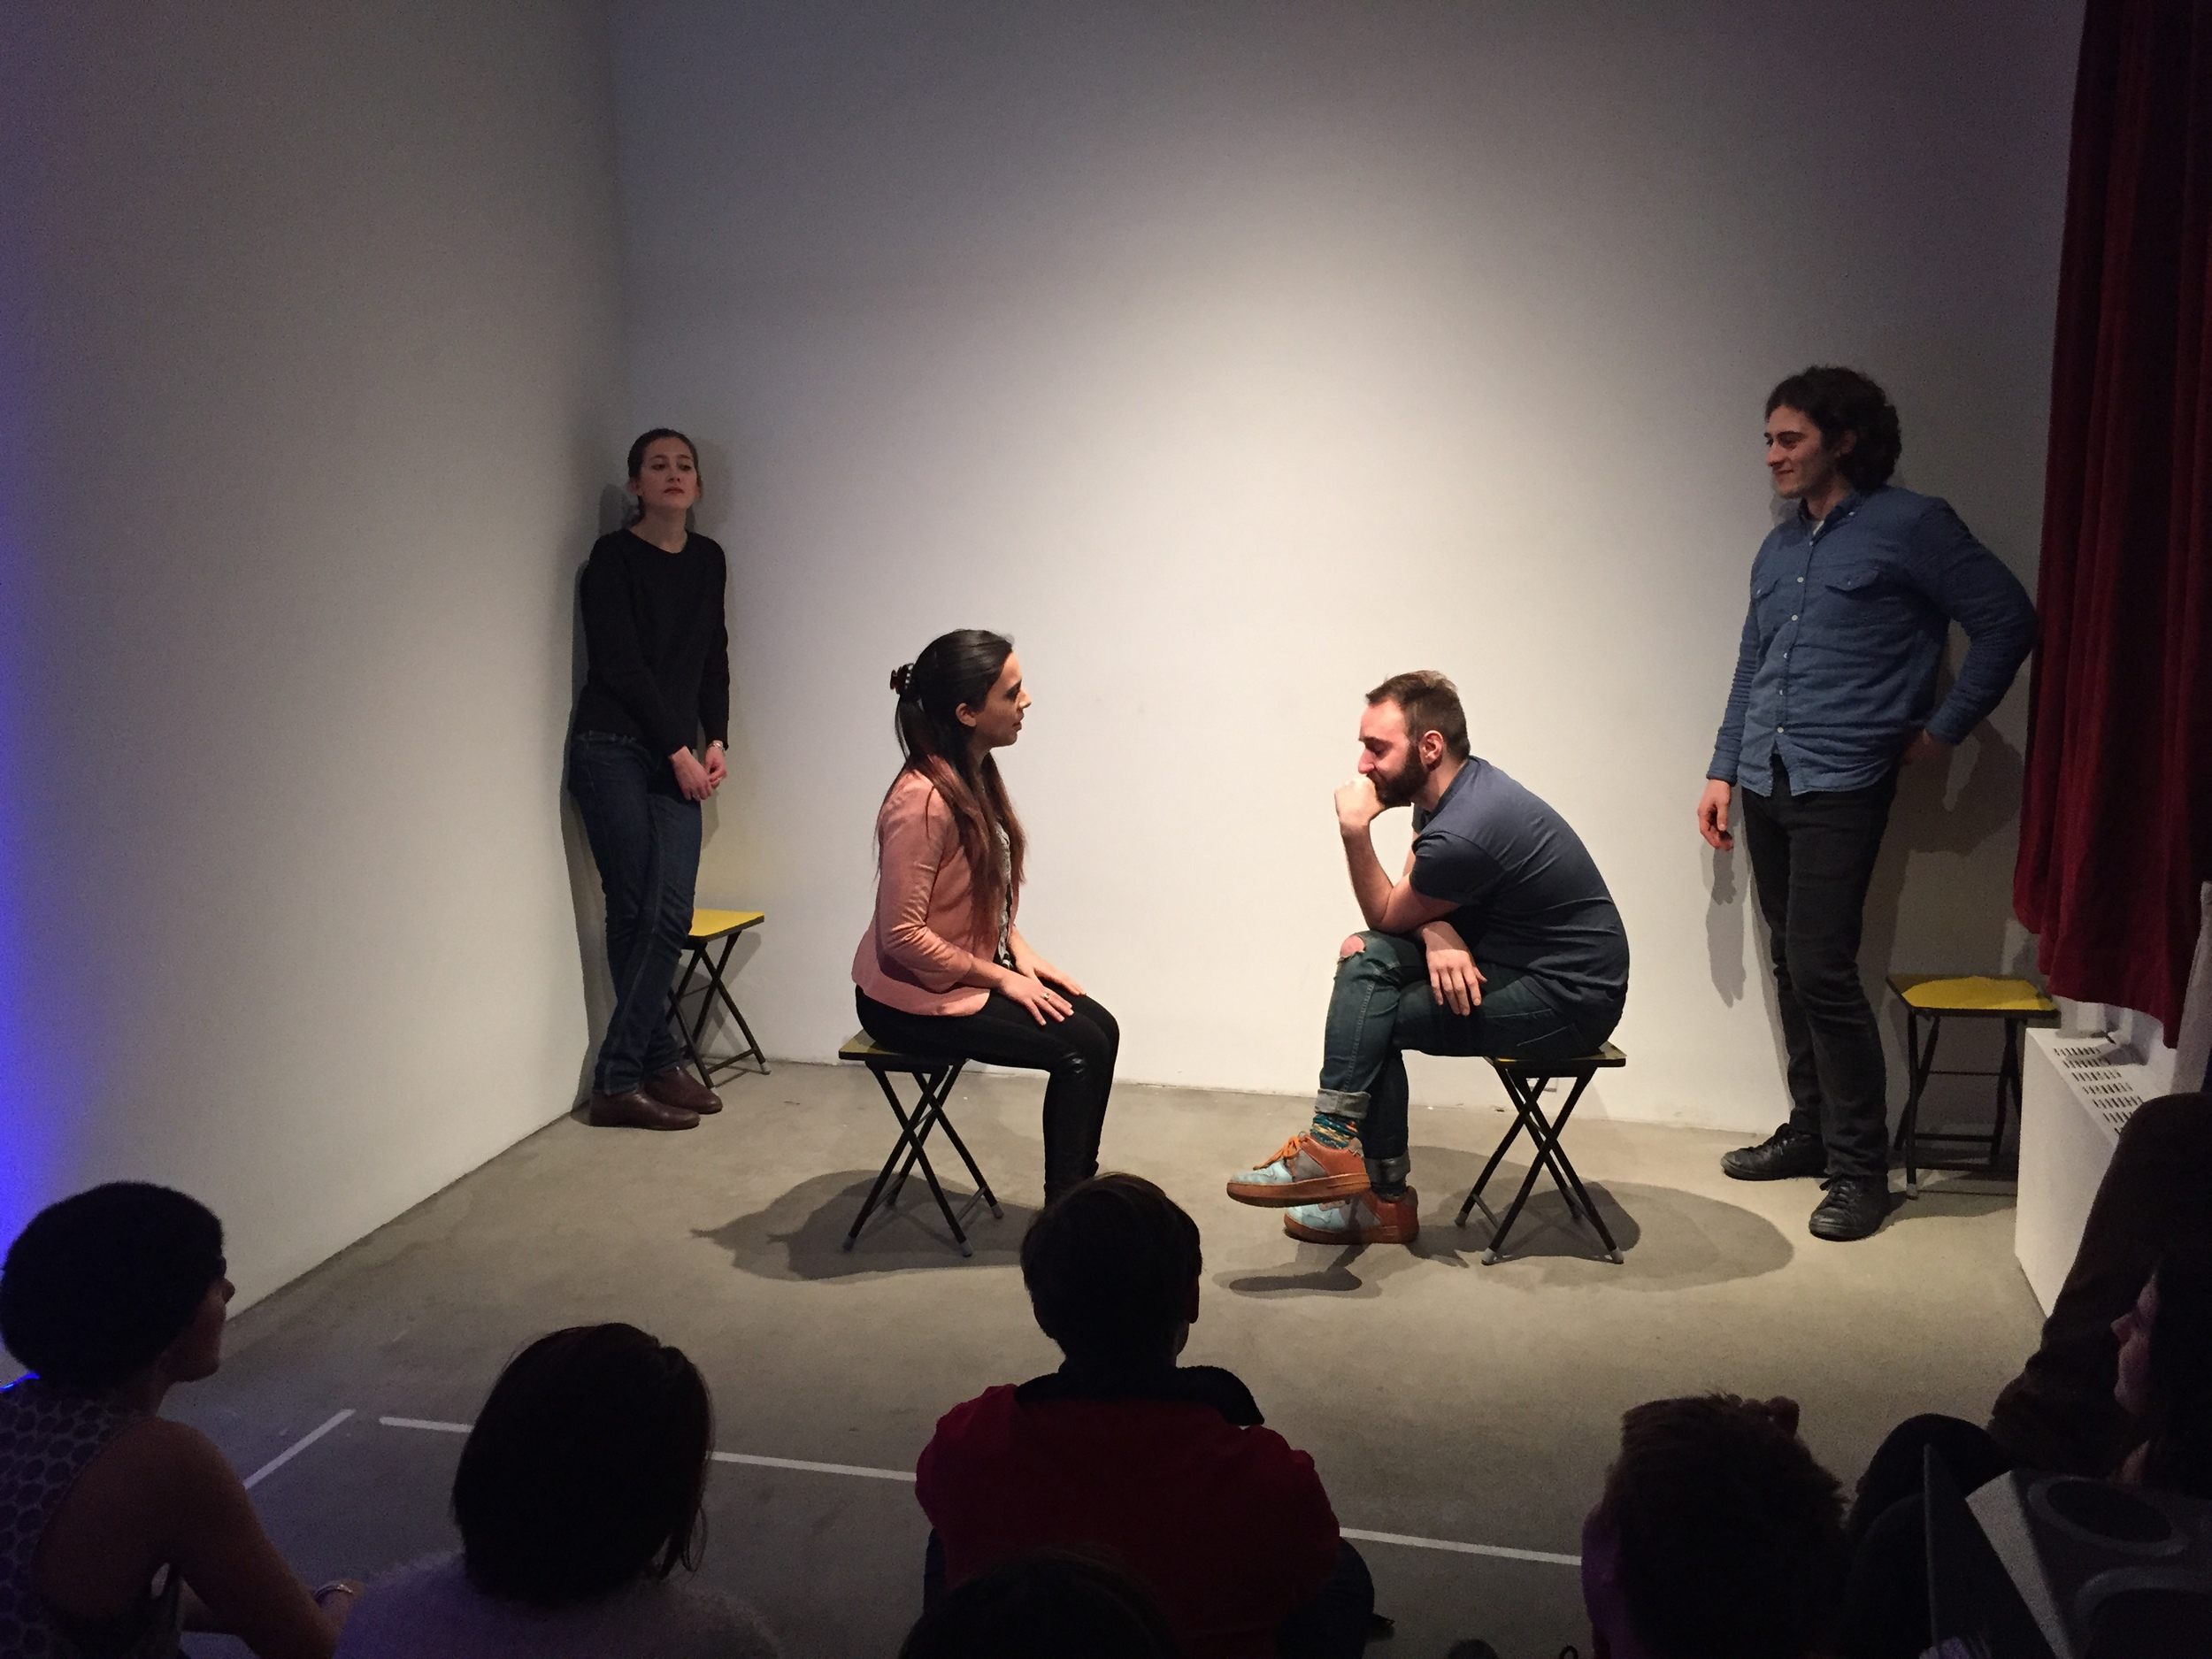 Improv performance by Peter Valenti, et al., Saturday, February 14, 2015, photo courtesy of Emma Benschop